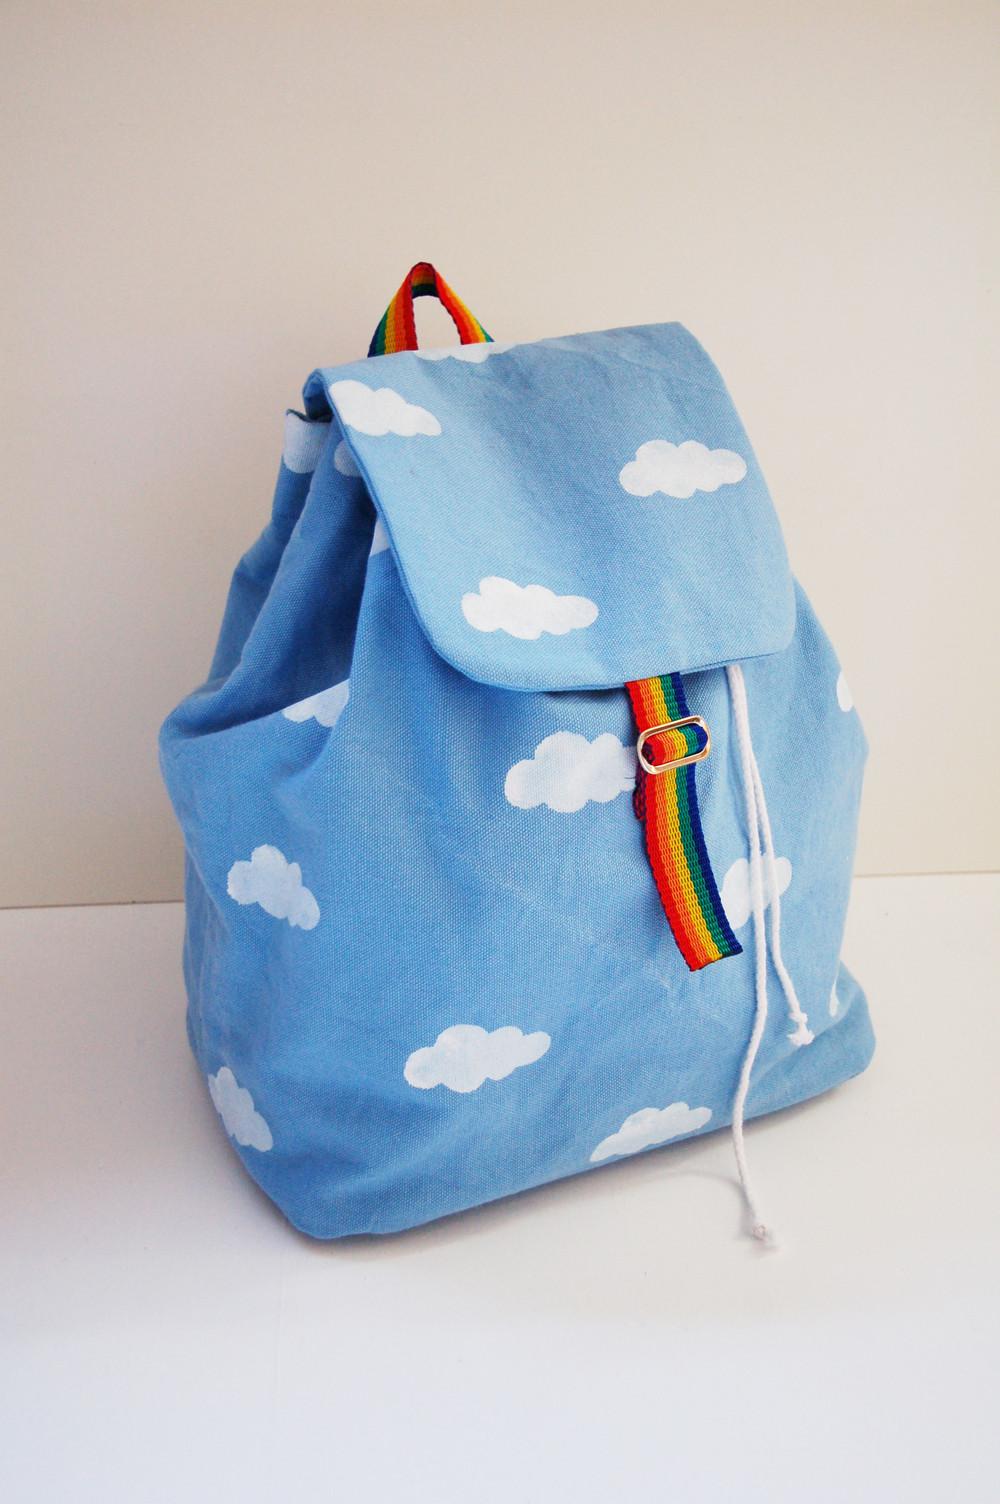 Diy Rucksack  13 Trendy and Affordable DIY Backpacks